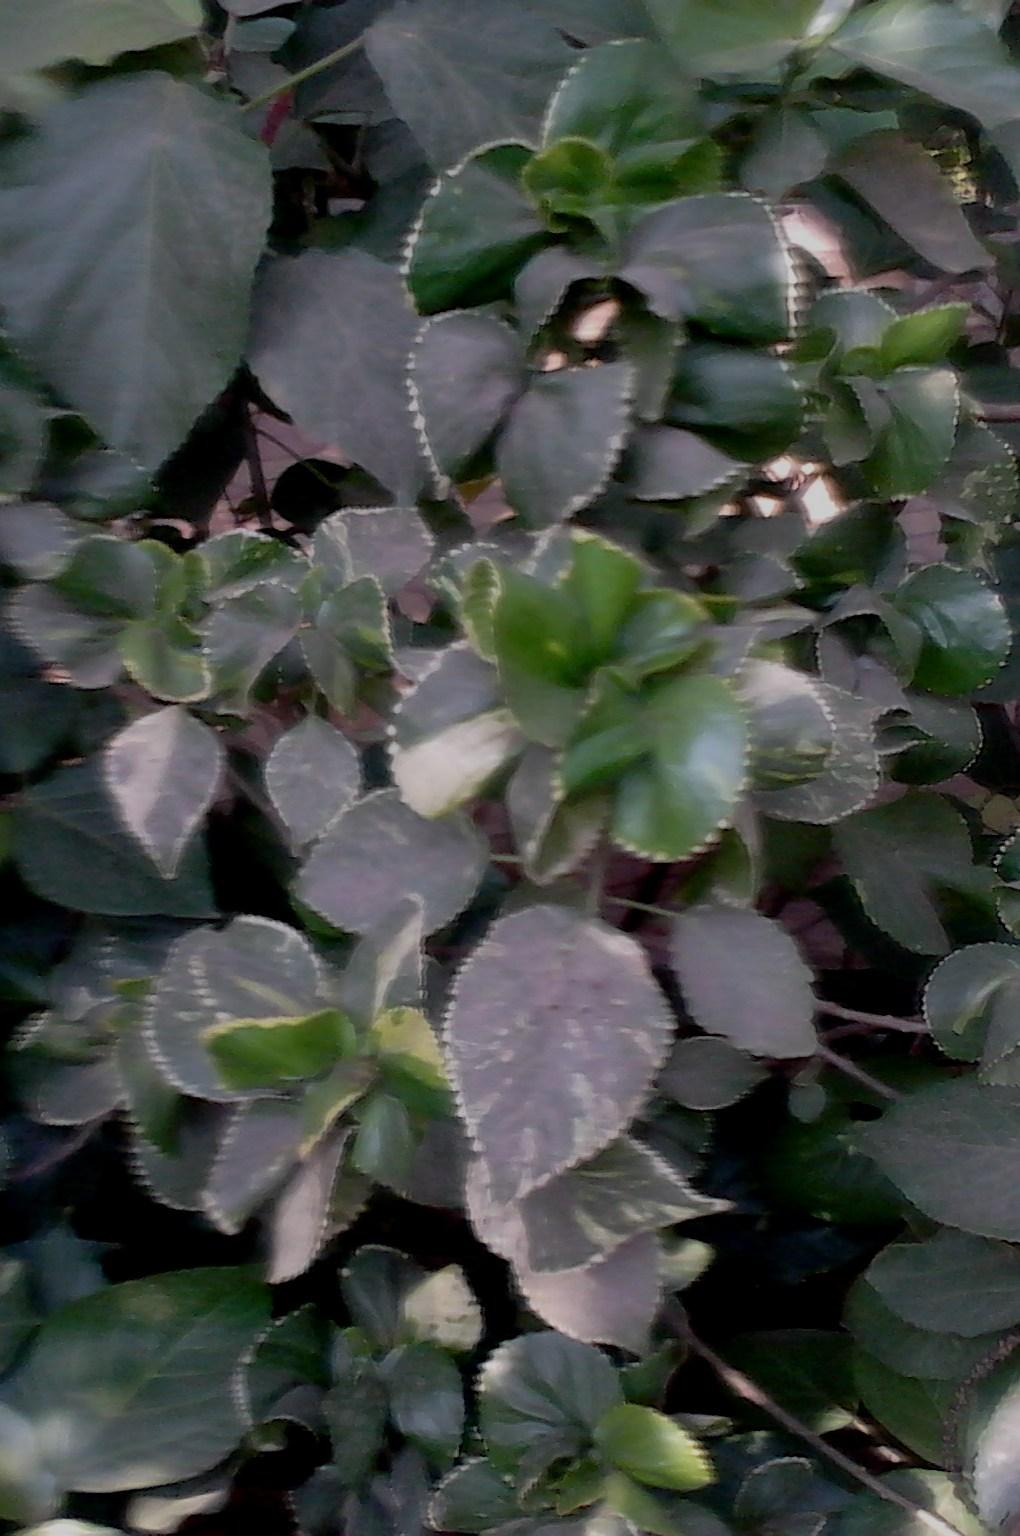 Garden care simplified beautiful ornamental leaf plant for Ornamental vegetable plants